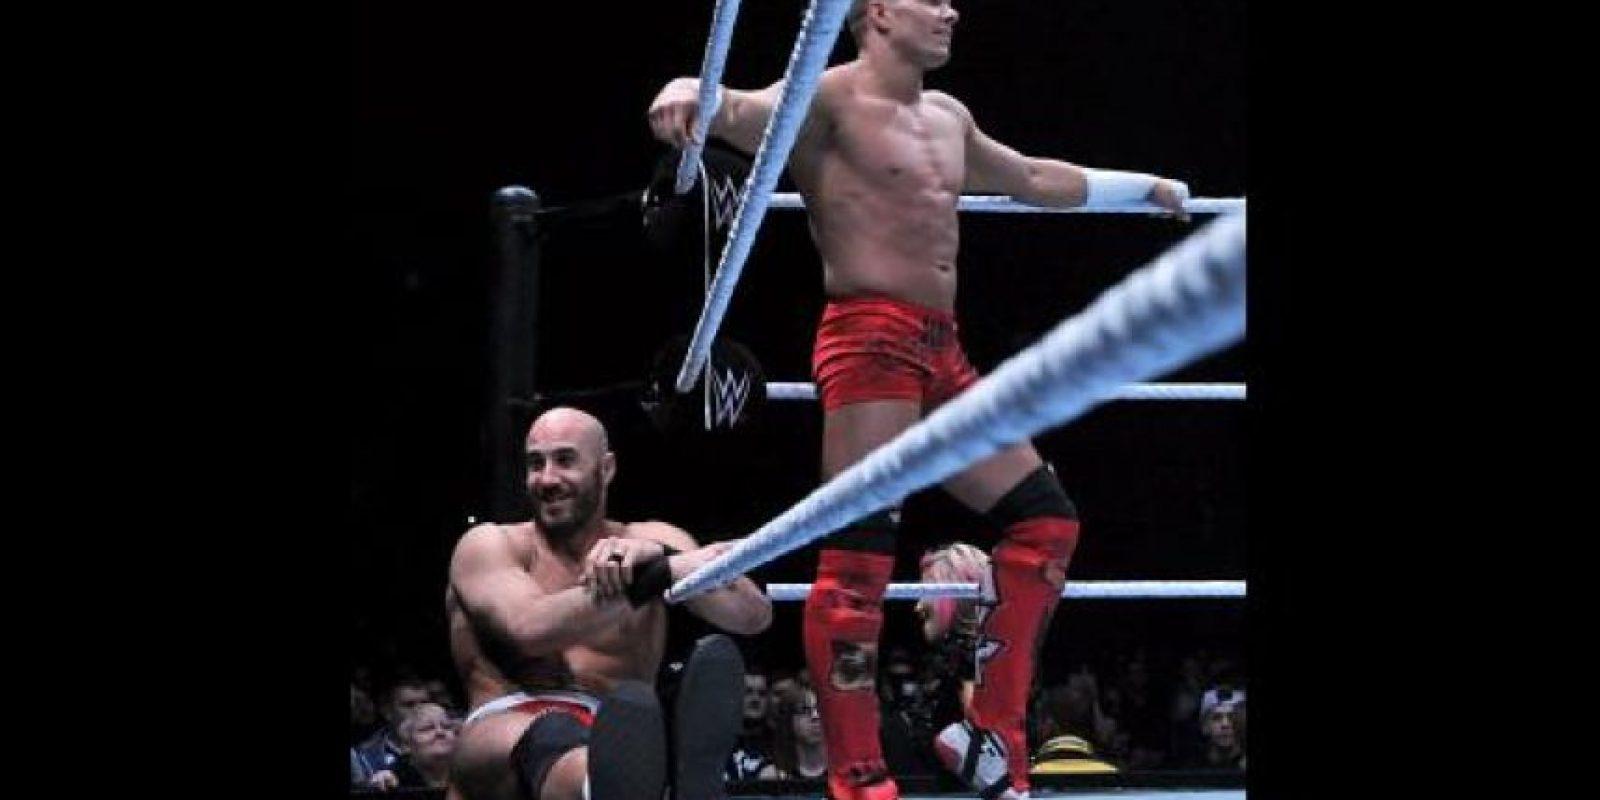 Se enfrentaban a Cesaro y Tyson Kid Foto:WWE